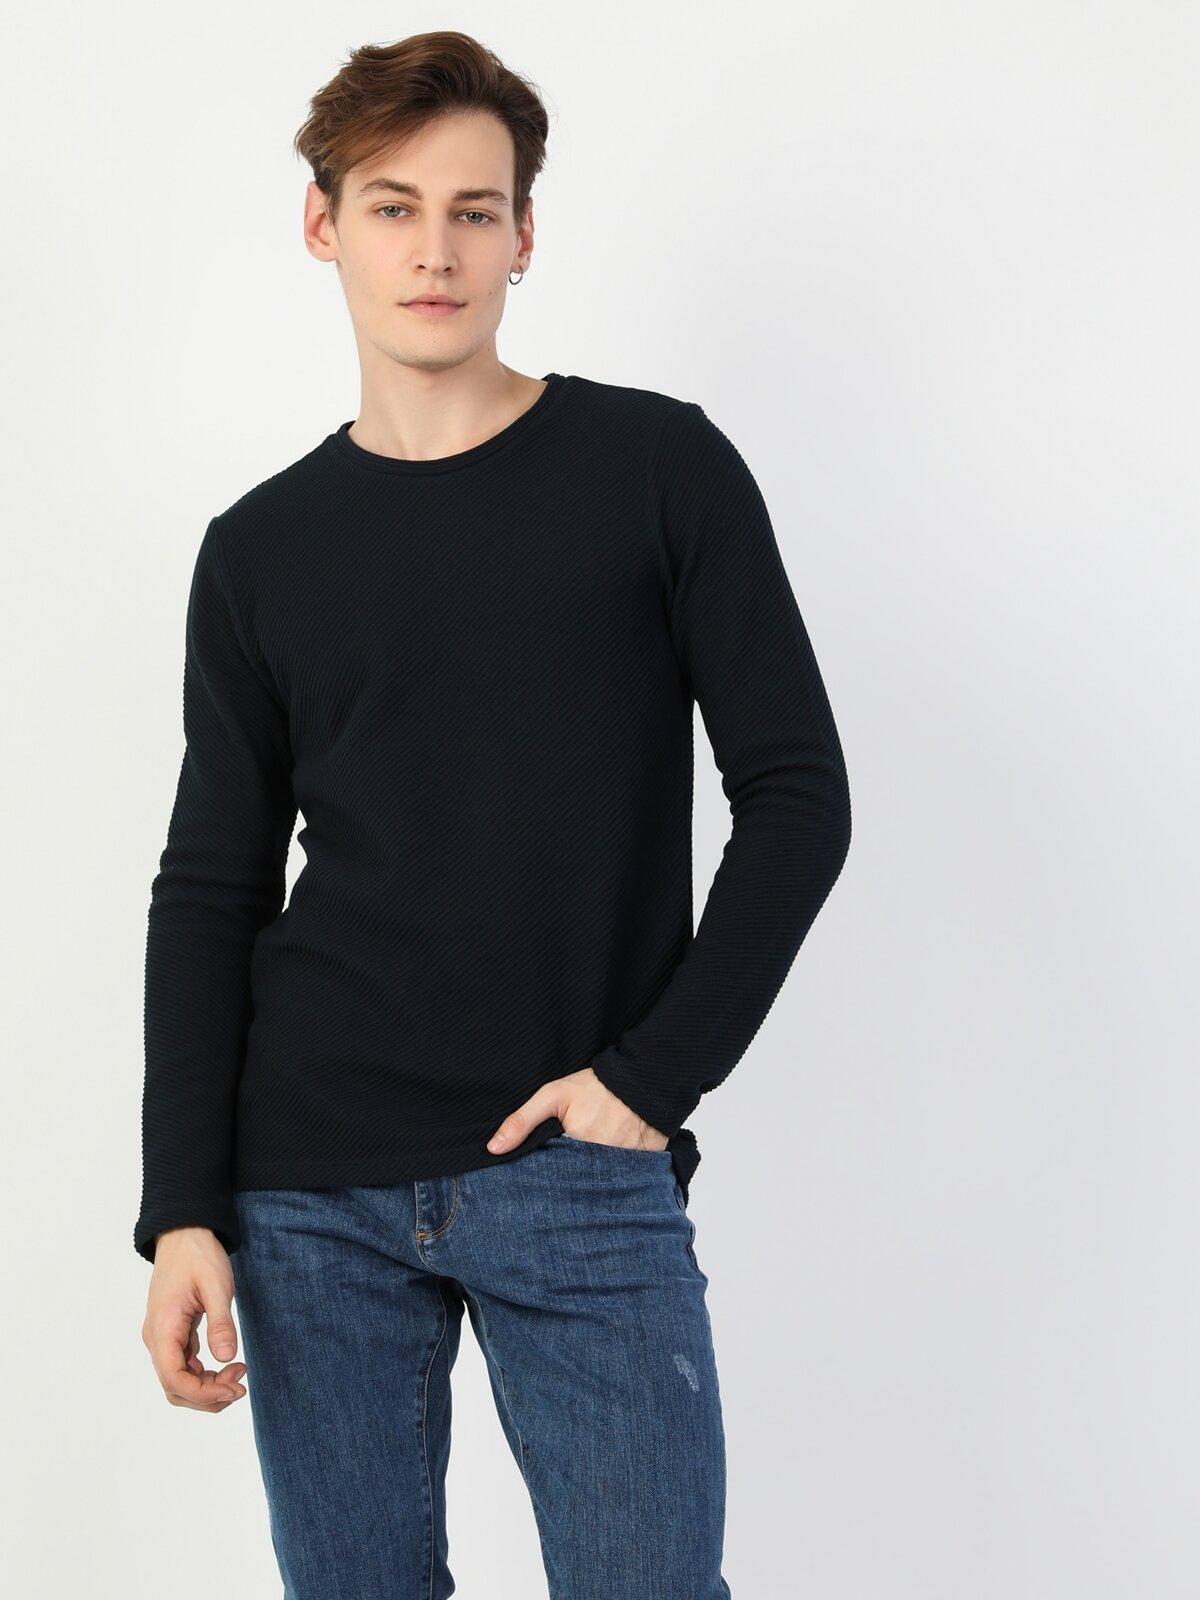 Regular Fit Erkek Bisiklet Yaka Lacivert Uzun Kol Tişört